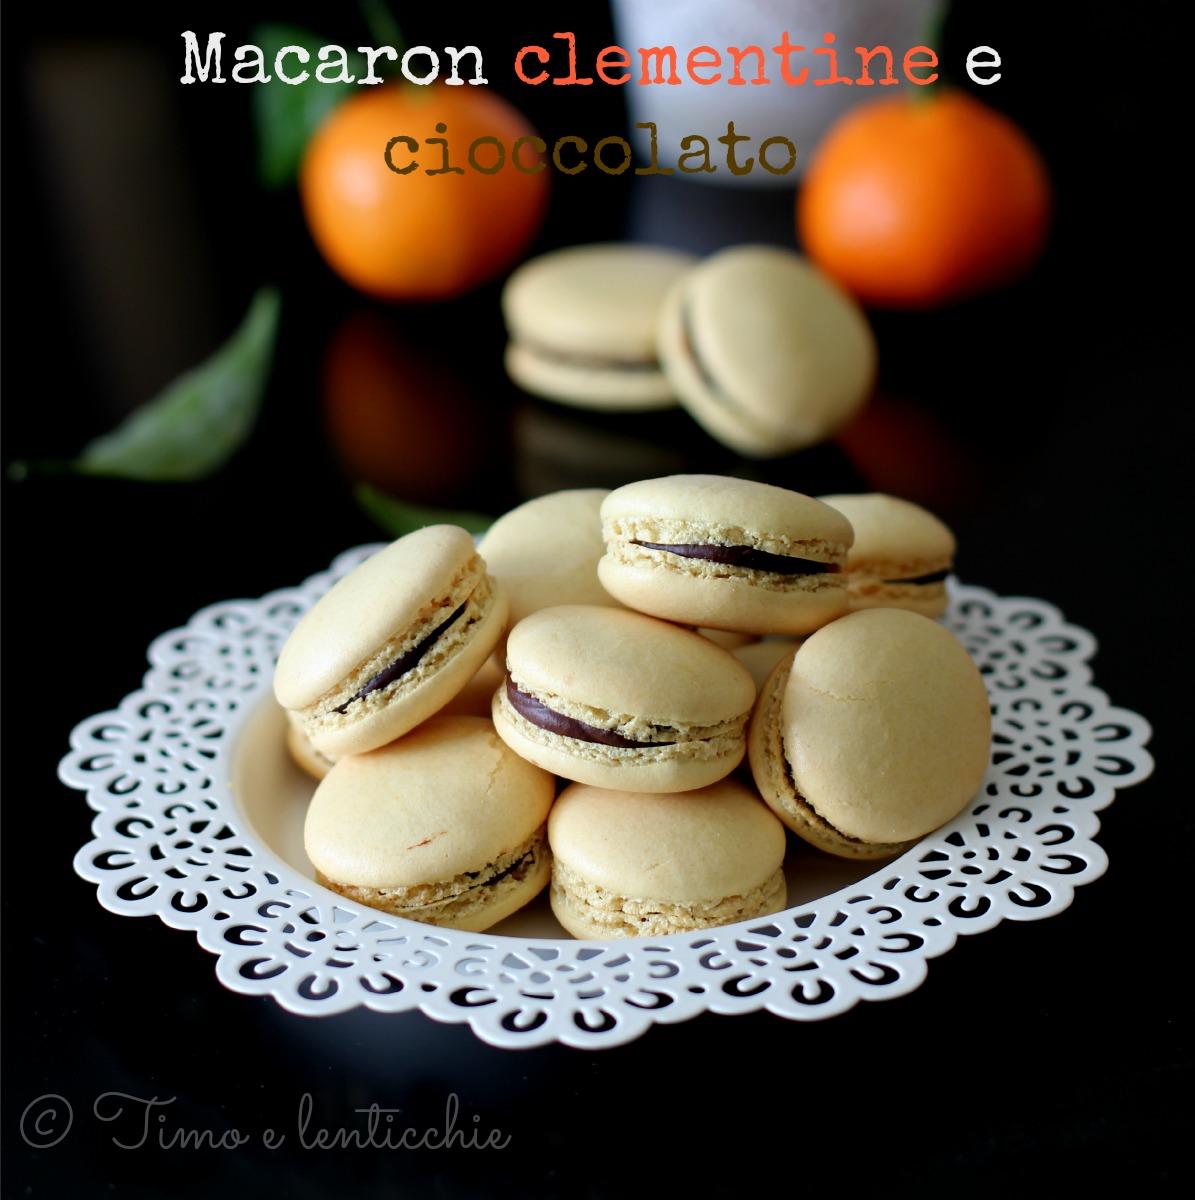 macarons 1200 jpg